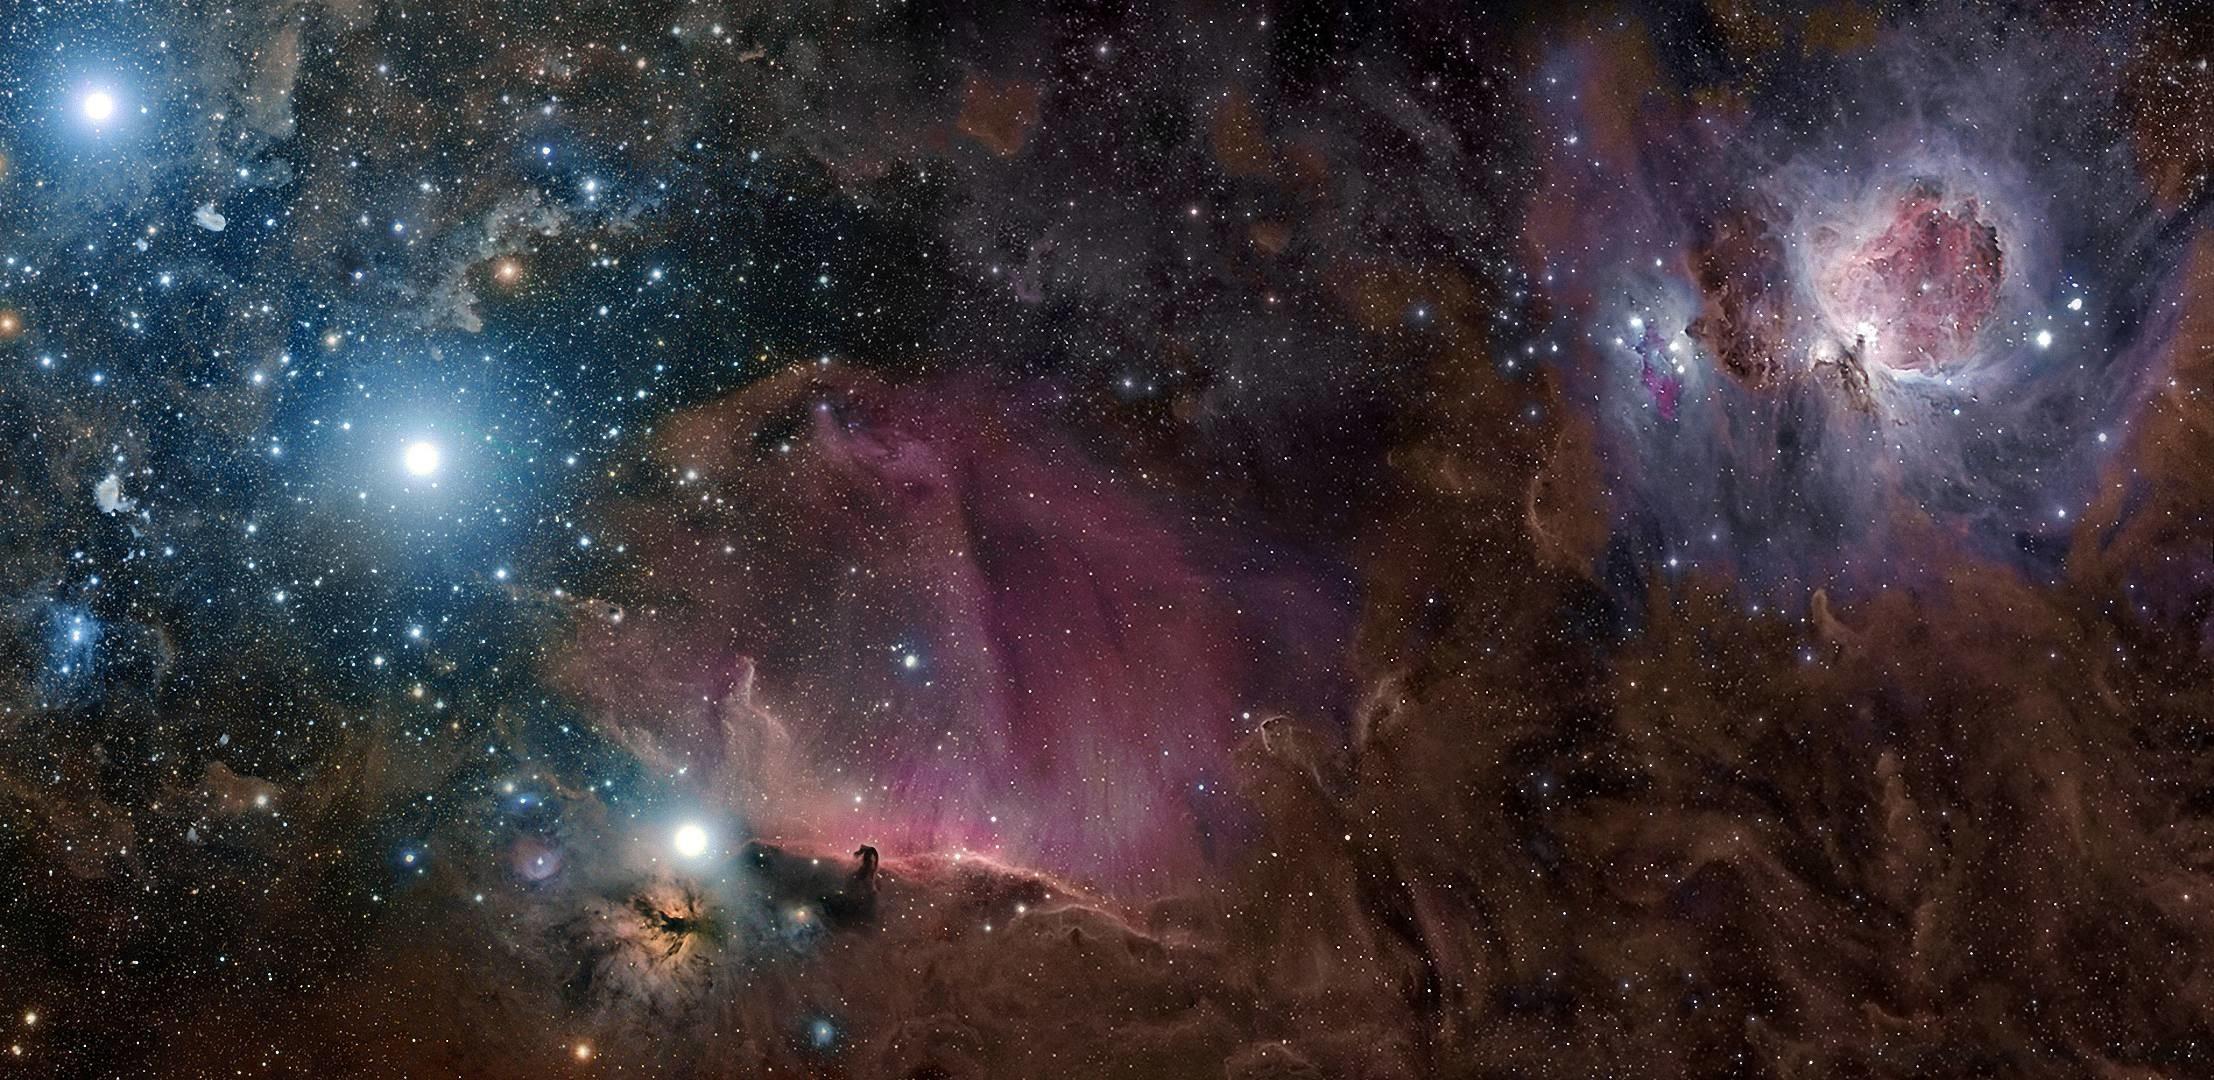 2214x1080 Download Wallpaper Orion Constellation Nebula Gas Free Desktop